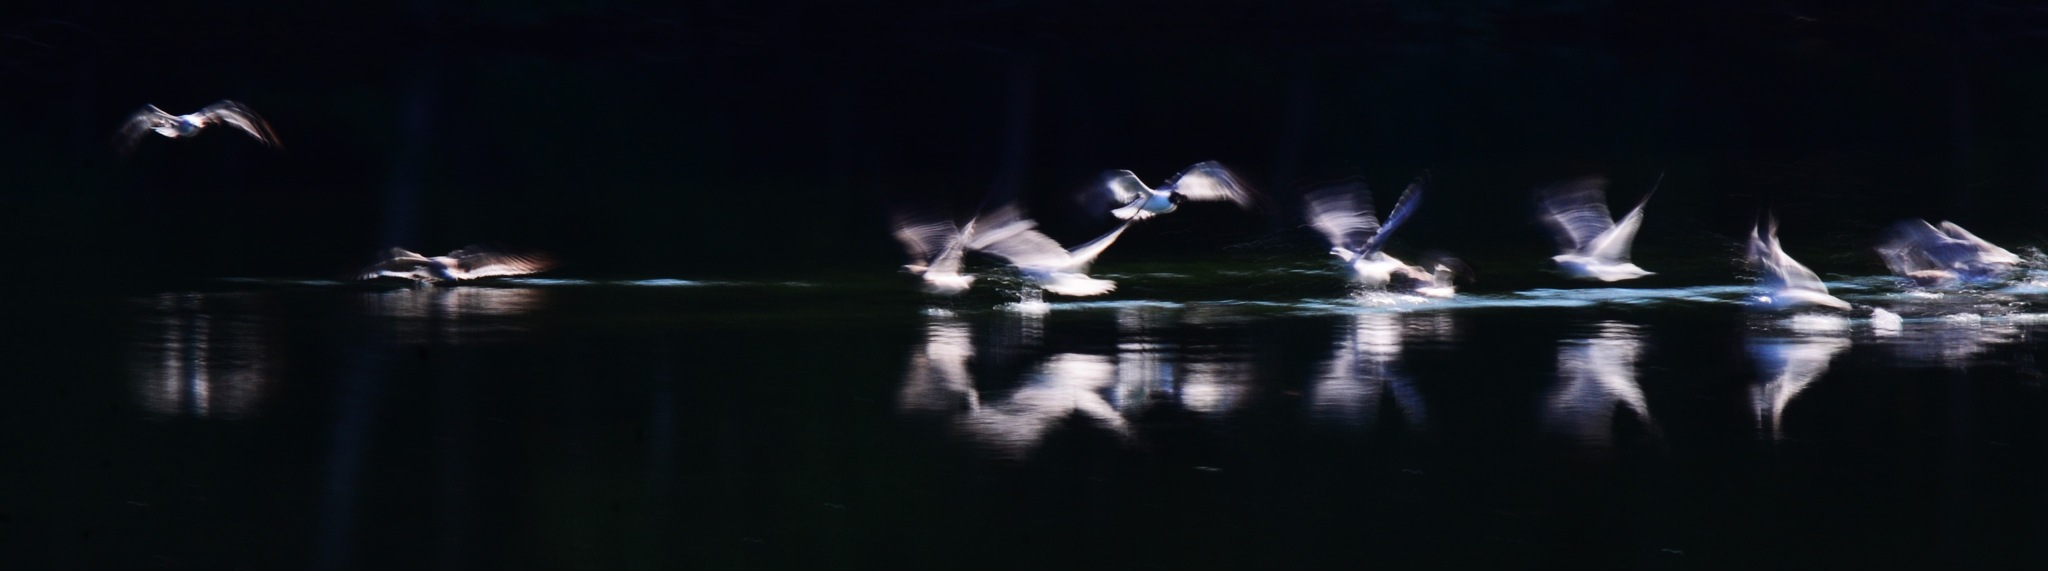 Untitled by dabbleshots